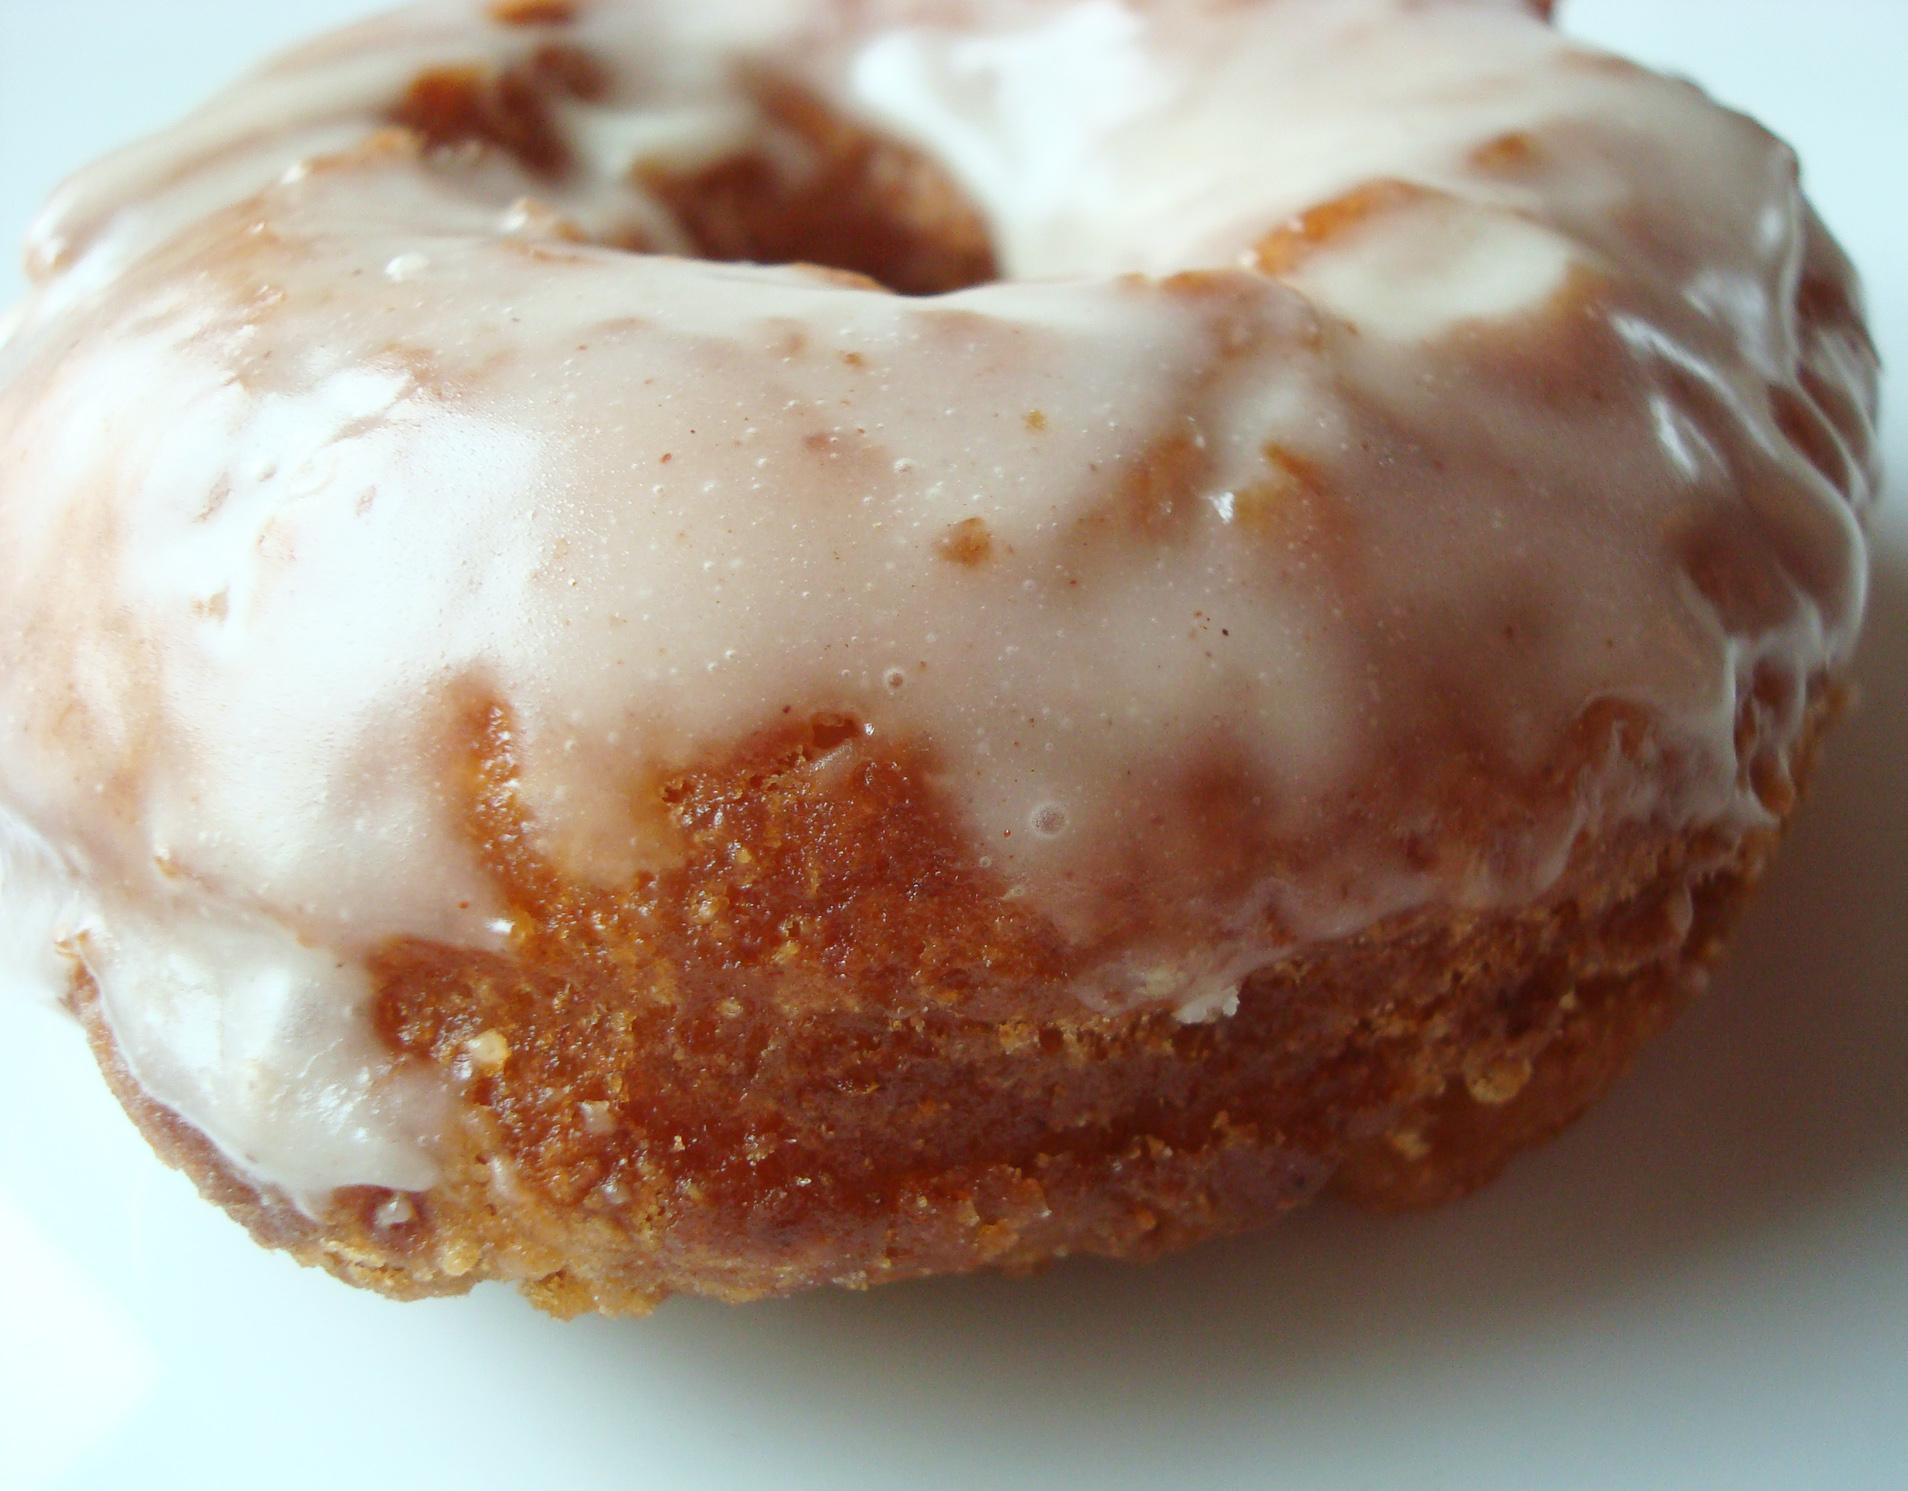 Close Up on Glazed Doughnuts